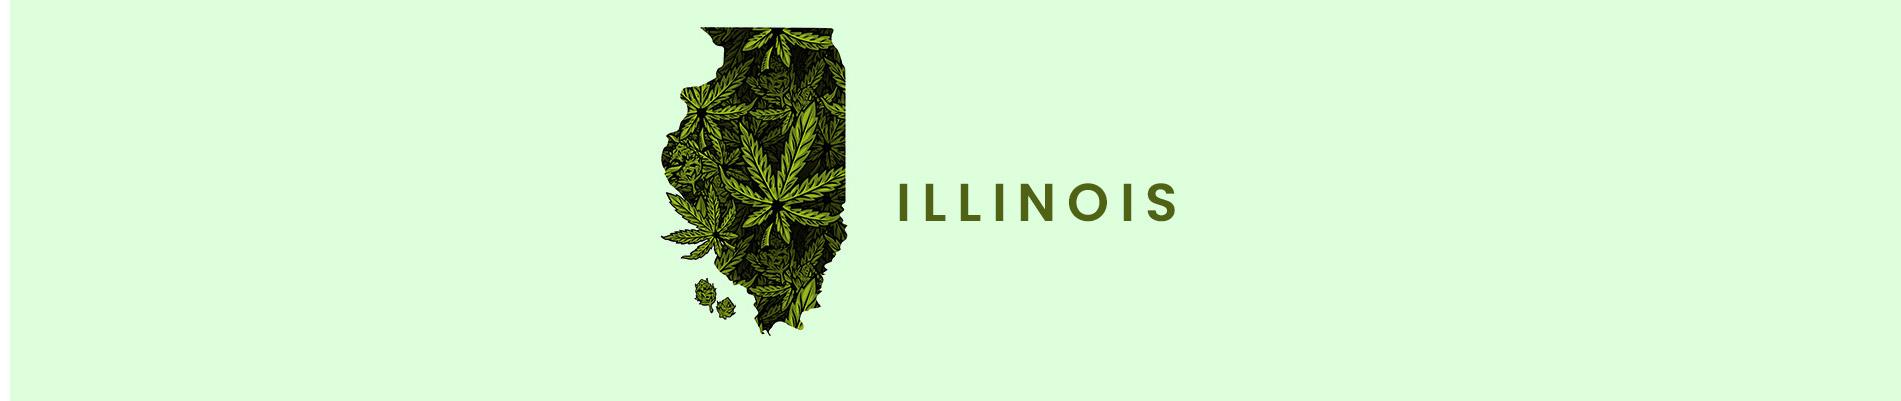 Medical Marijuana Card in Illinois